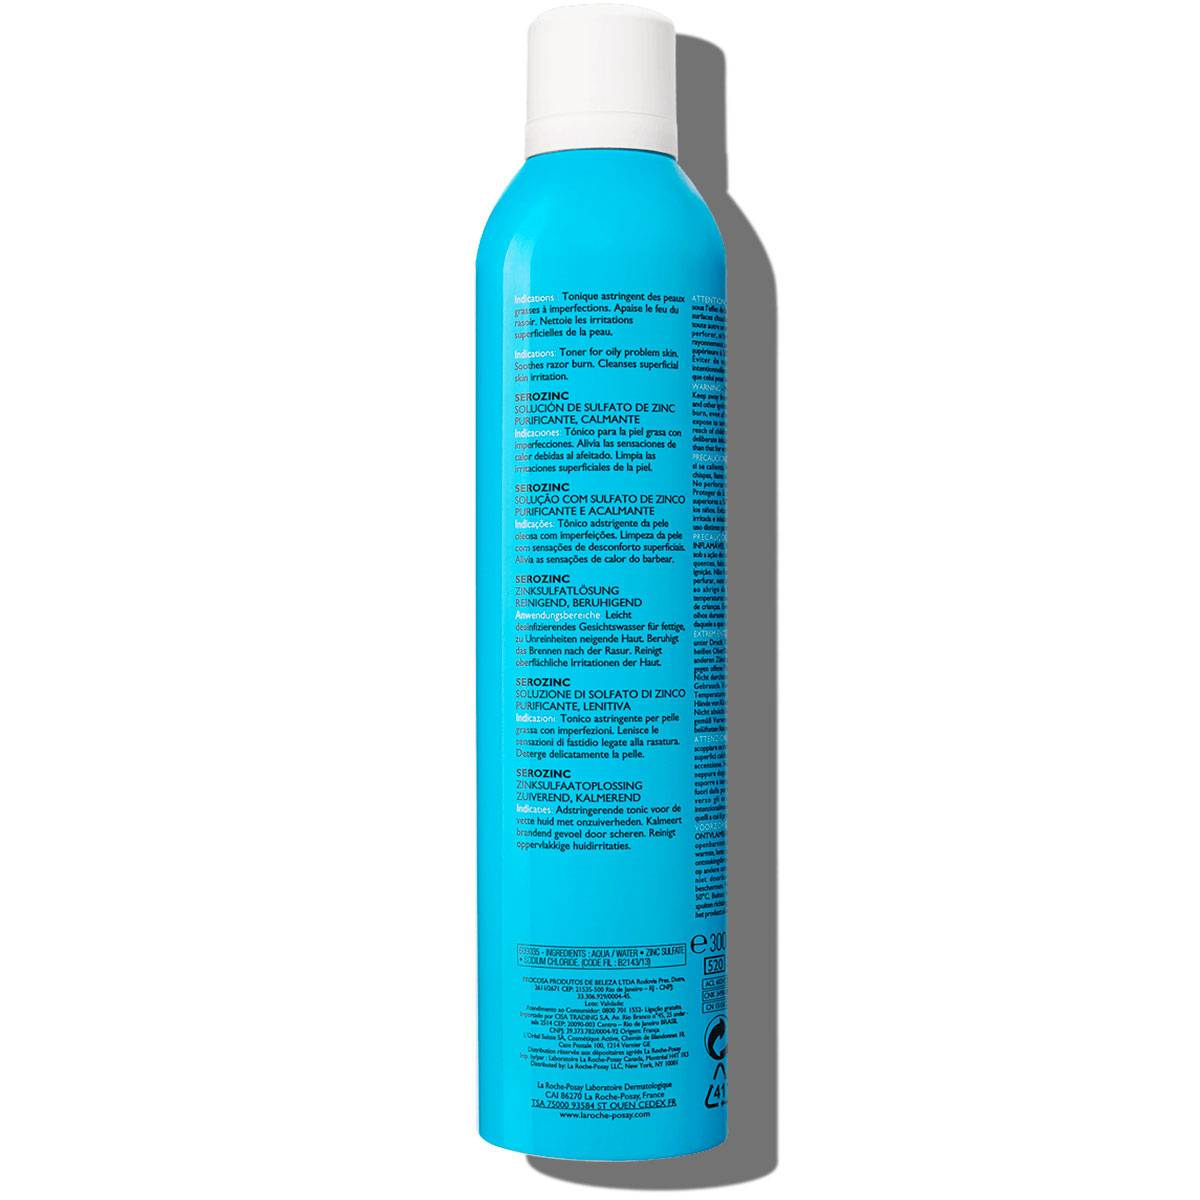 La Roche Posay ProductPage Serozinc Spray Zinc 300ml 3337875565783 Bac